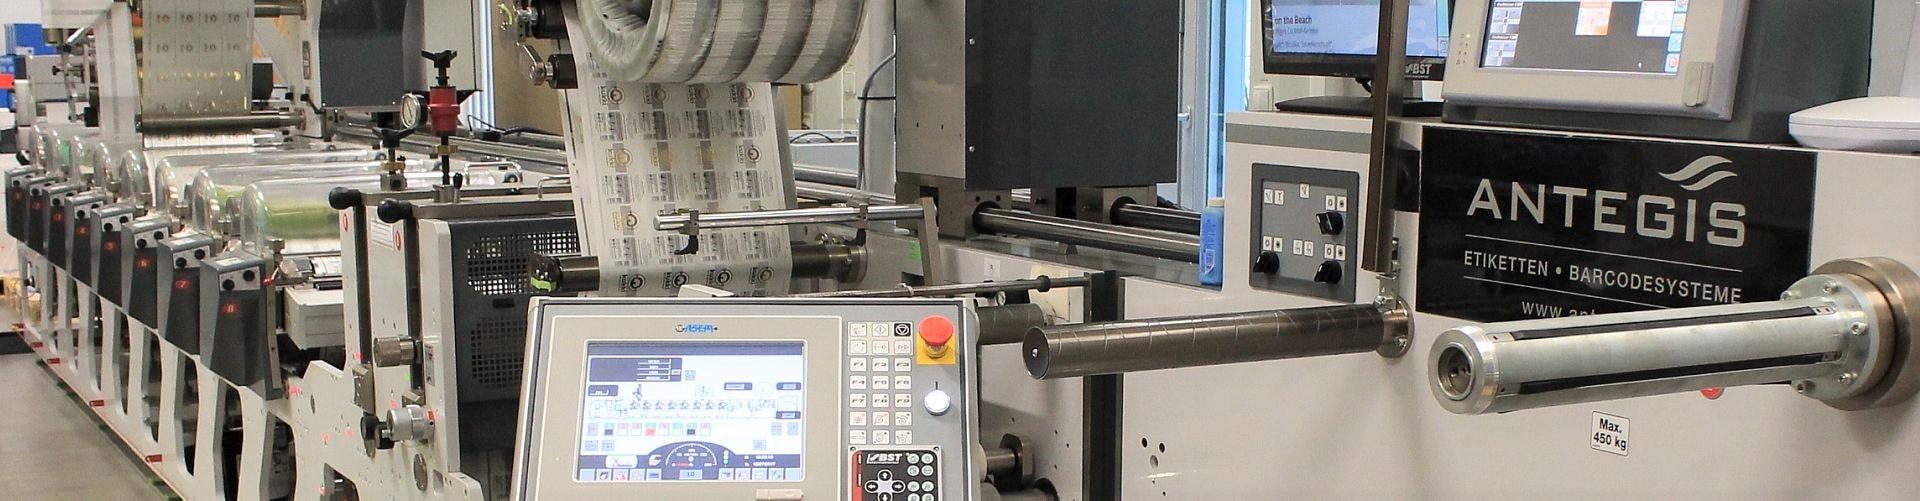 Etikettendruckerei-Berlin-ANTEGIS